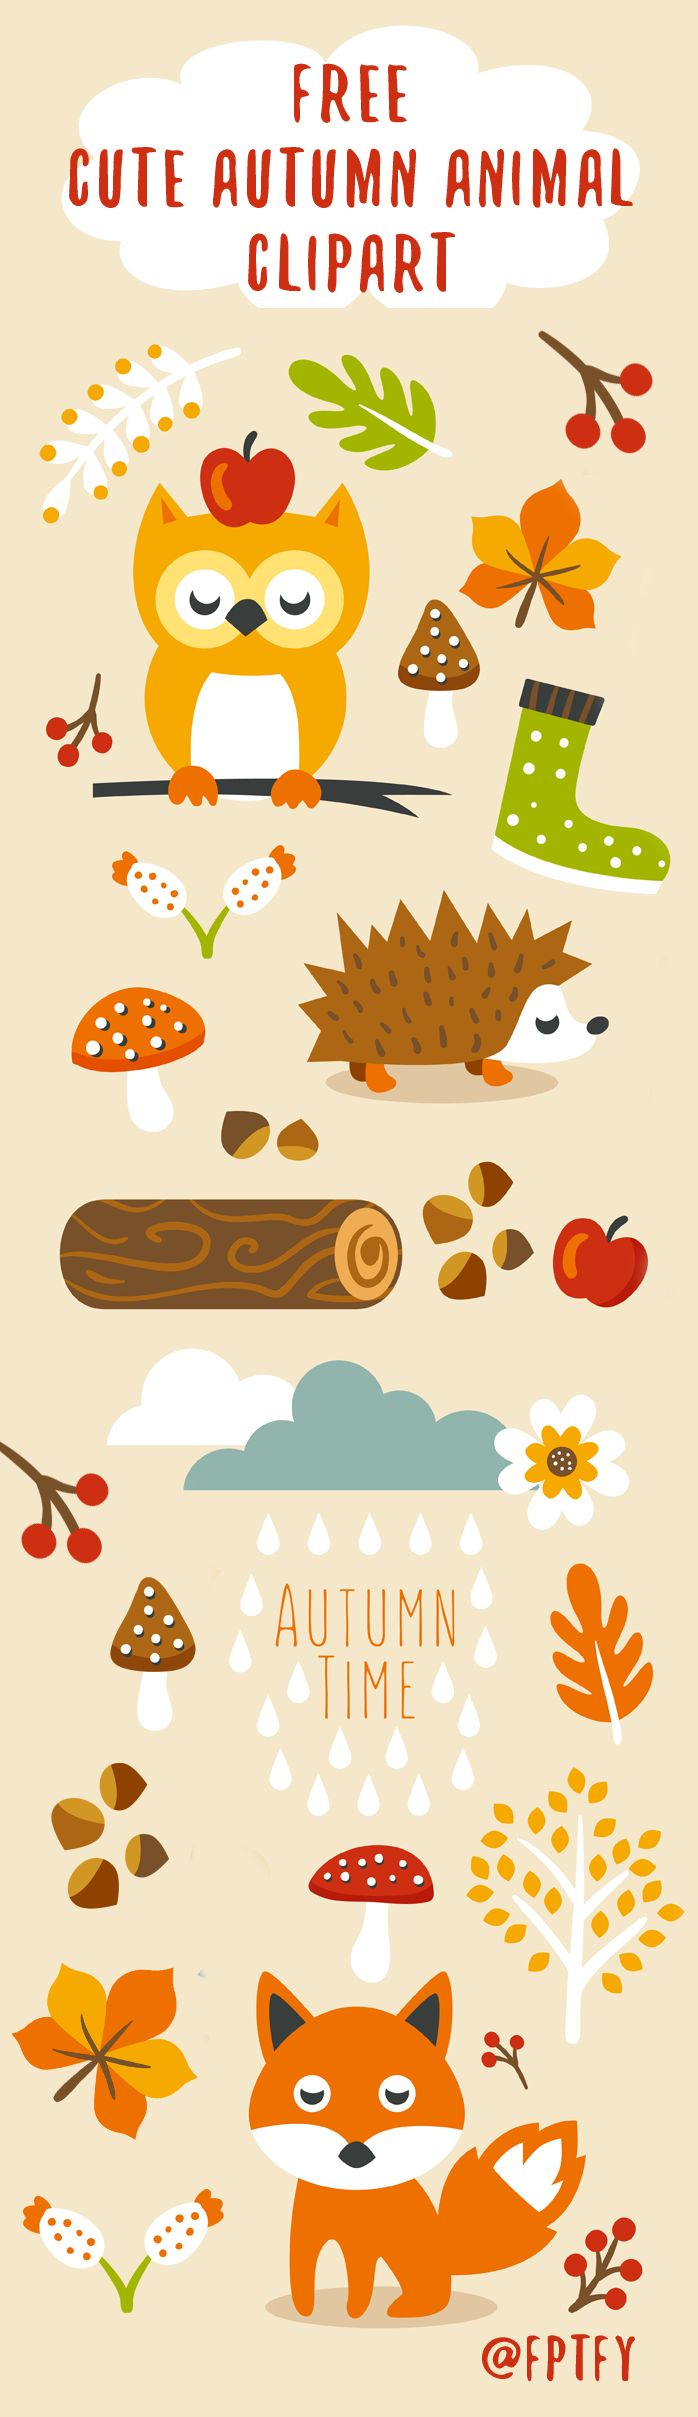 17 Best ideas about Fall Clip Art on Pinterest.